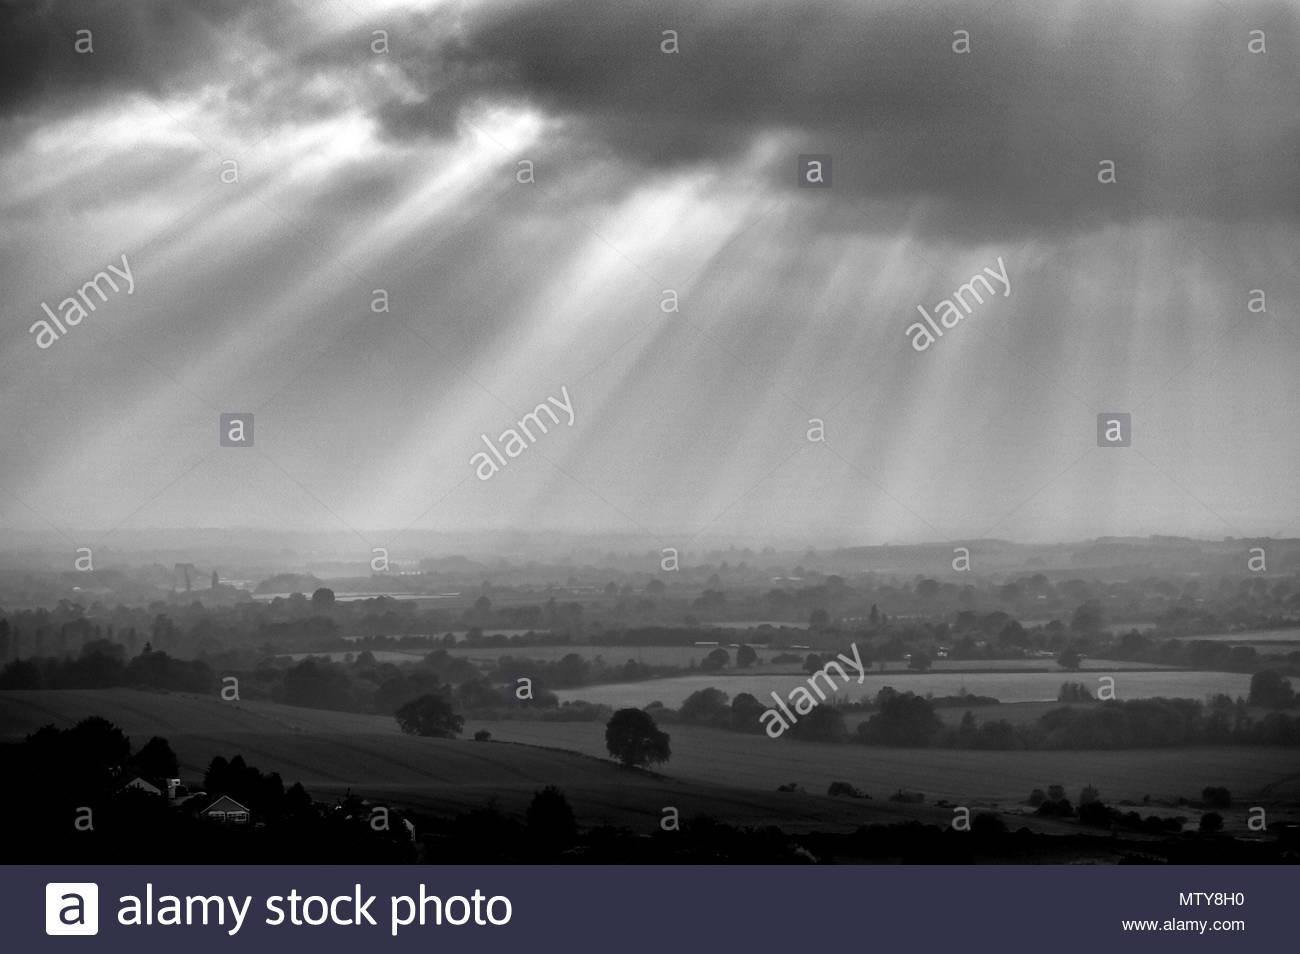 The sun's rays illuminate the Wiltshire Countryside near the villages of Edington and Bratton - Stock Image